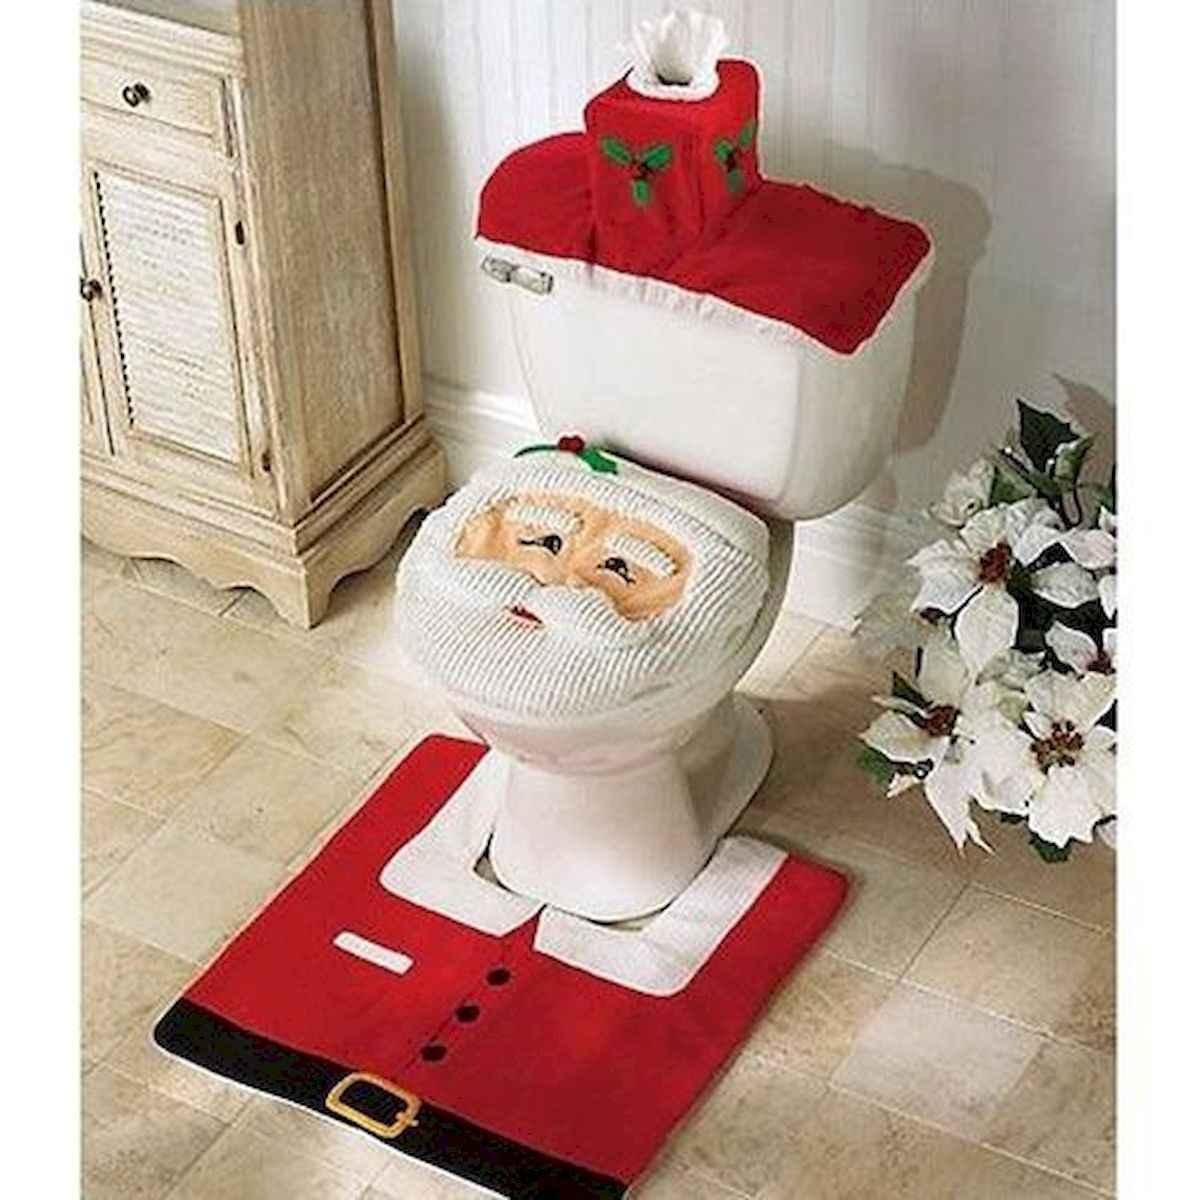 50 diy christmas decorations ideas (3)